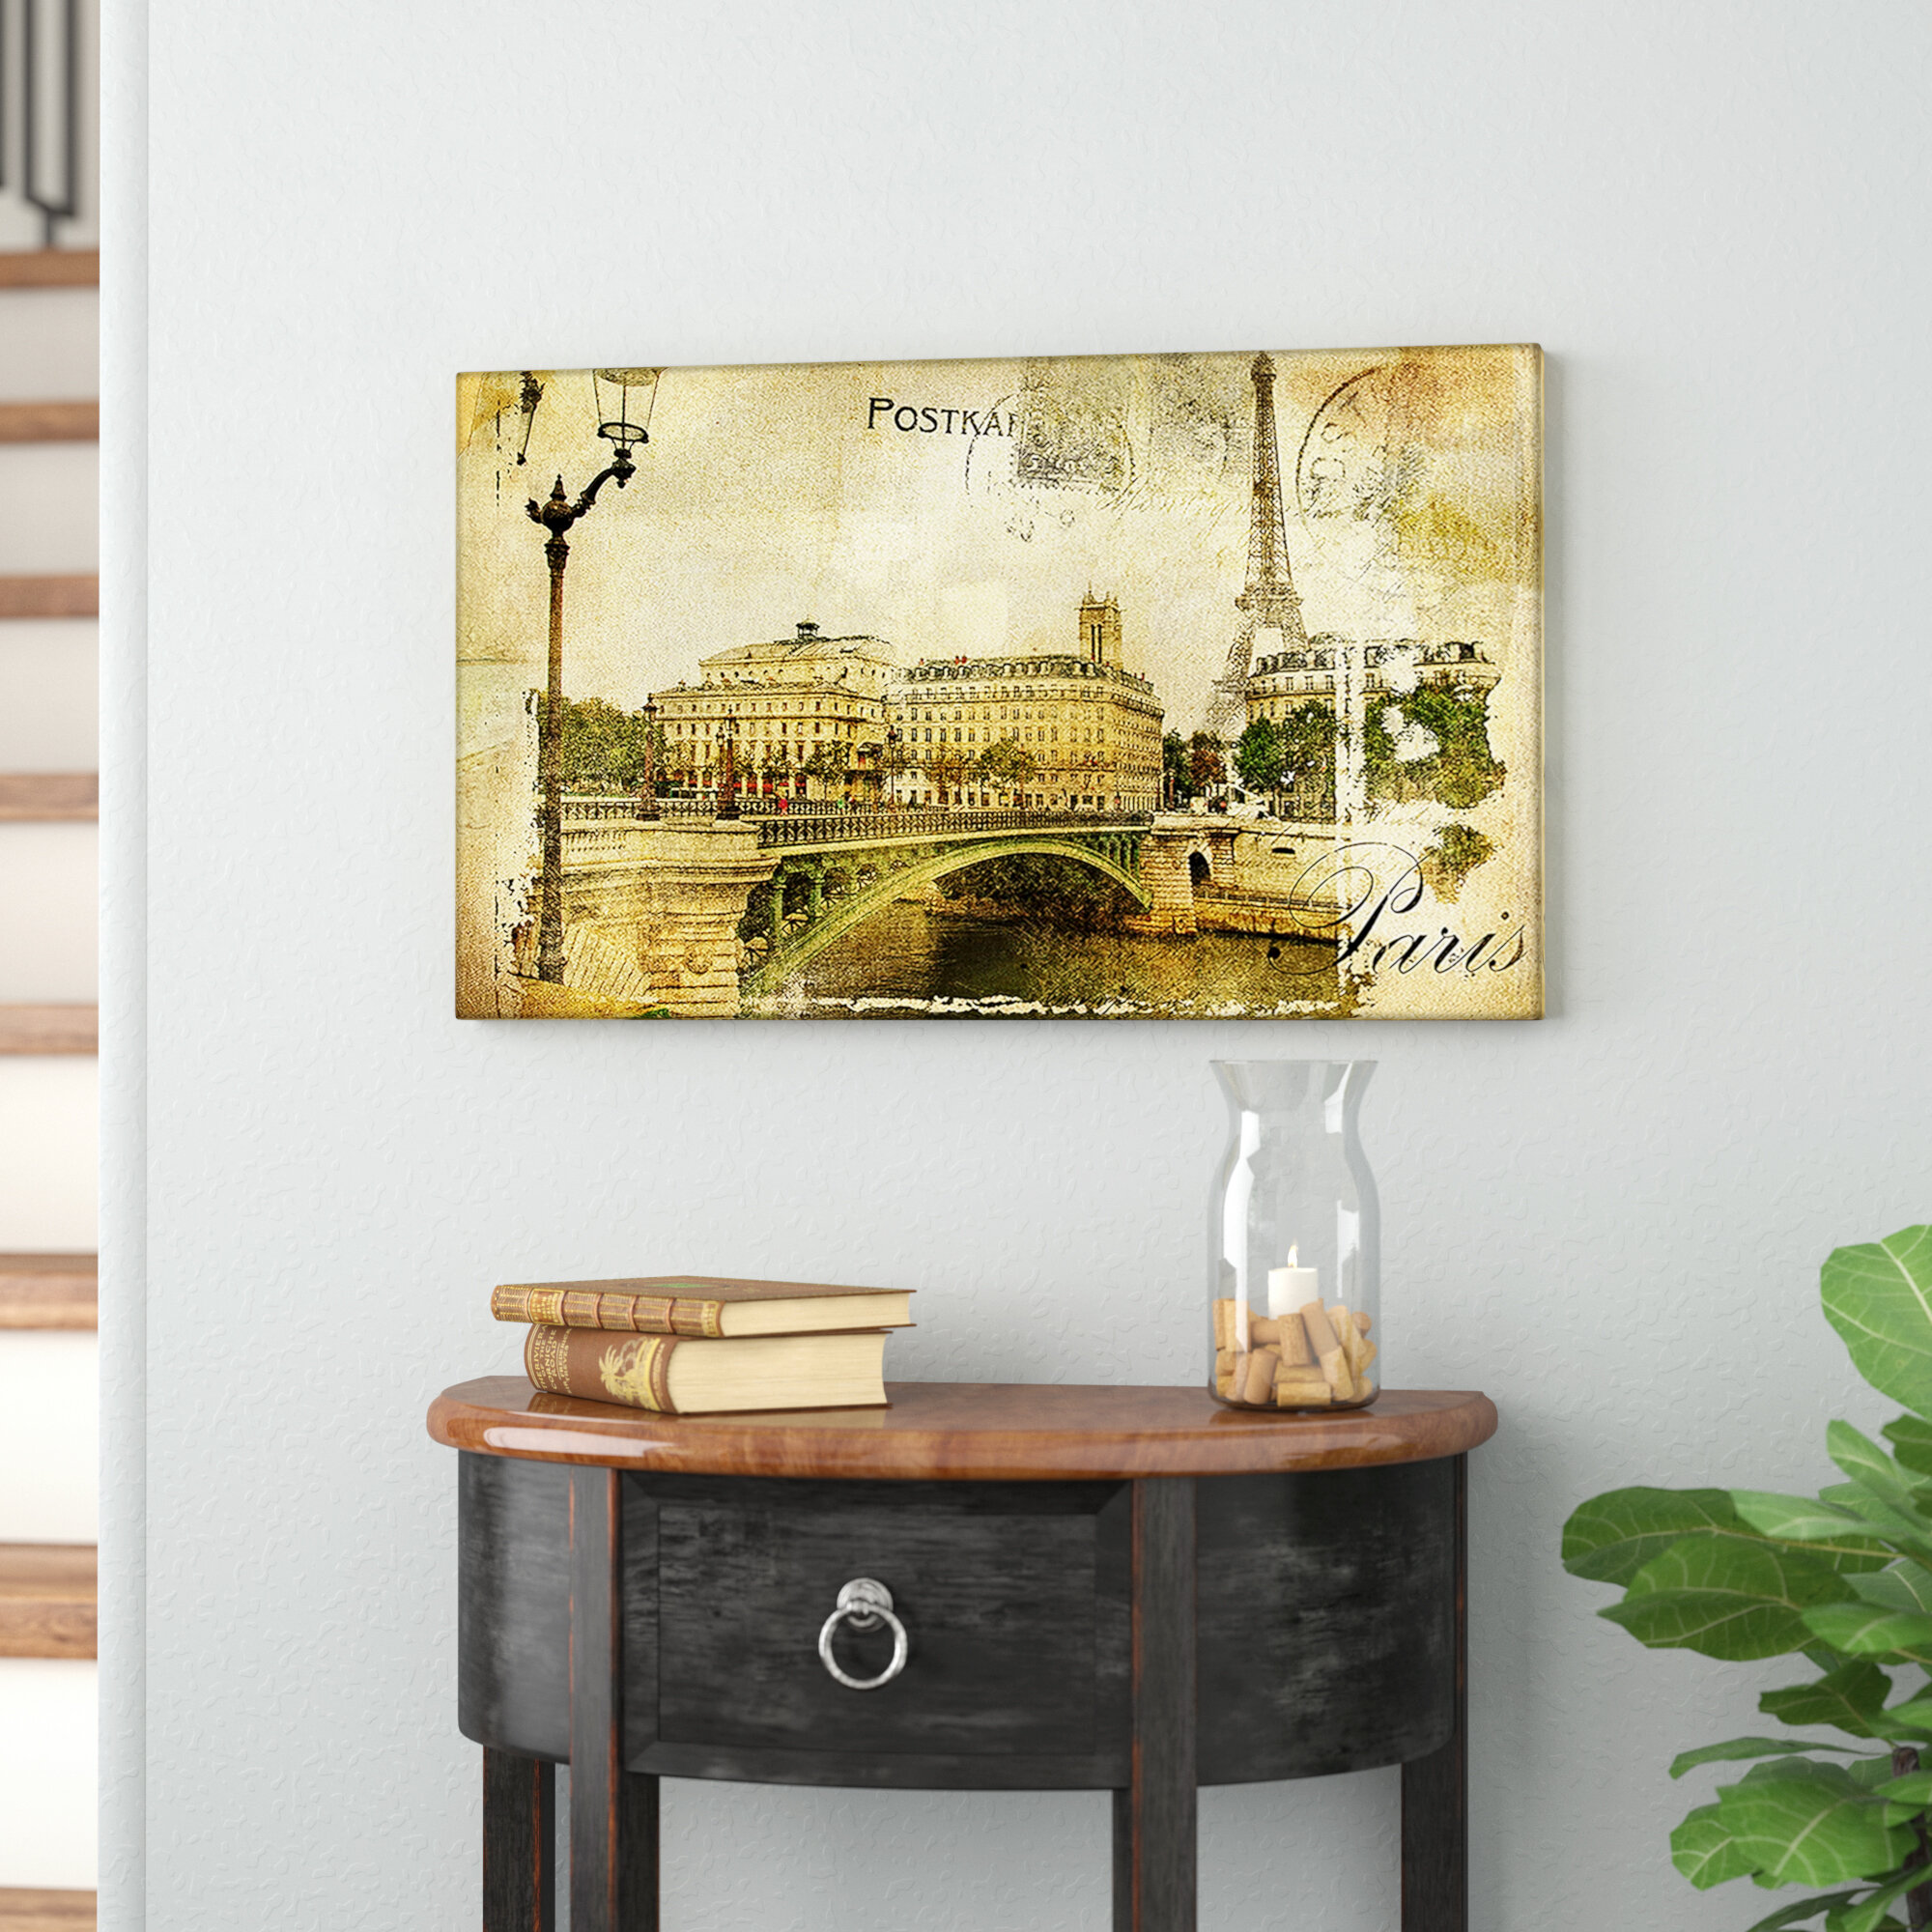 East Urban Home \'Vintage Paris\' Graphic Art Print on Canvas | Wayfair